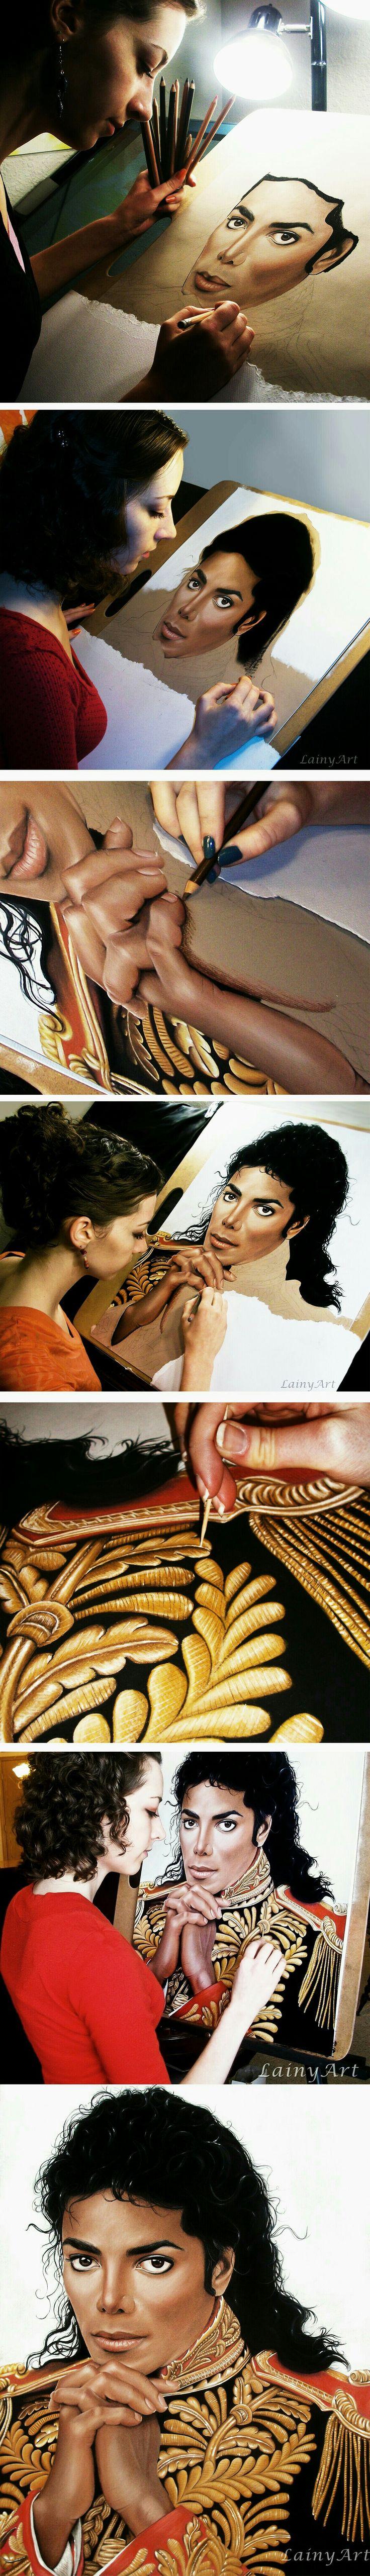 The king MJ ™️®️FollowChanel Monroe